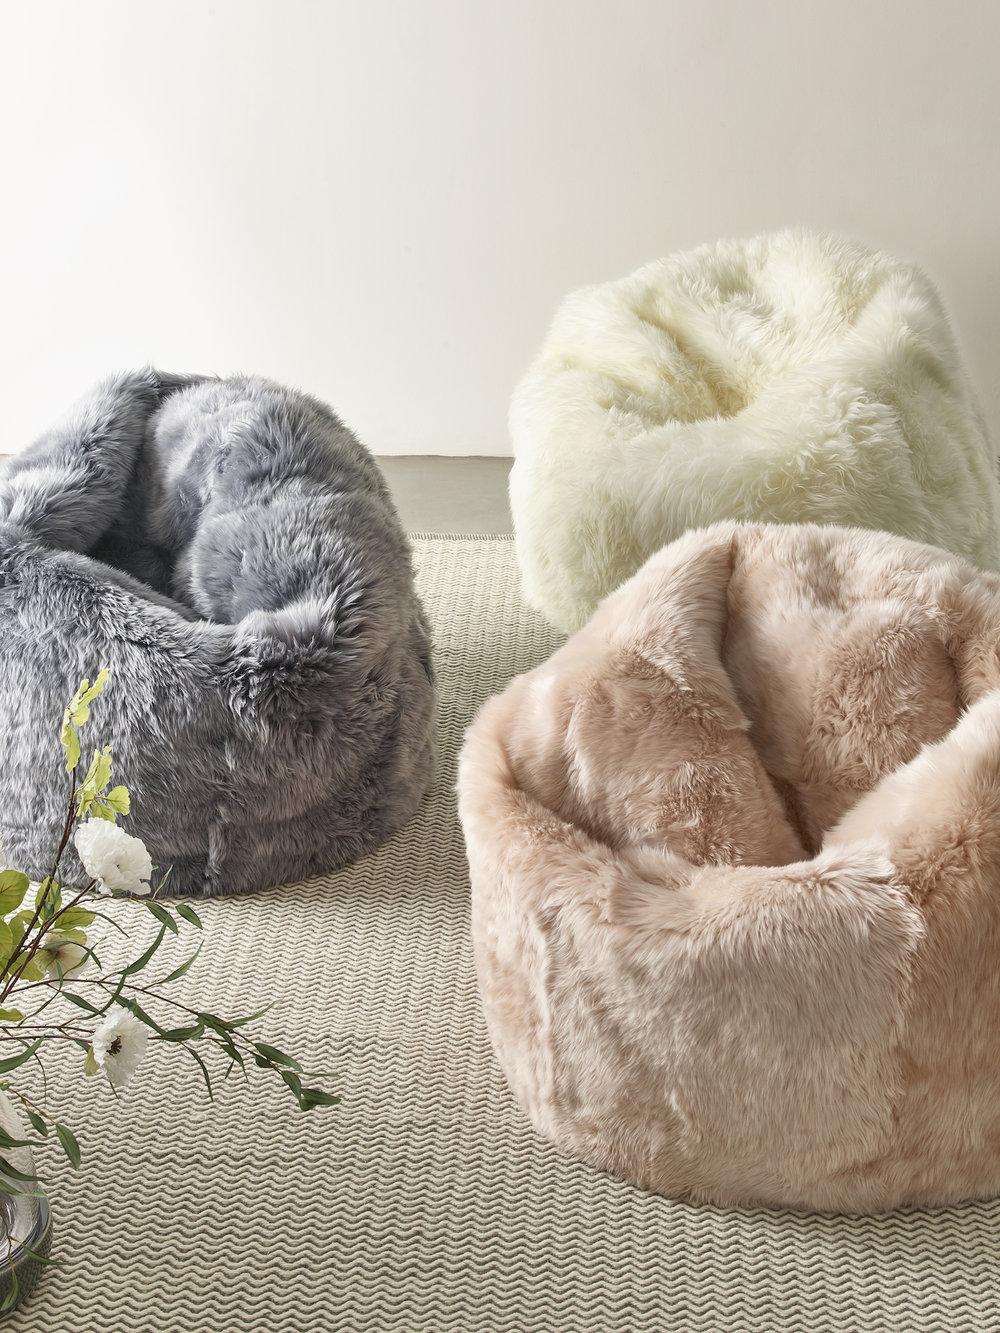 www.coxandcox.co.uk Sumptuous Sheepskin Beanbags HERO Grey H-BEANSHEPGRY Blush H-BEANSHEPBLUS Ivory H-BEANSHEEP £800.00.jpg